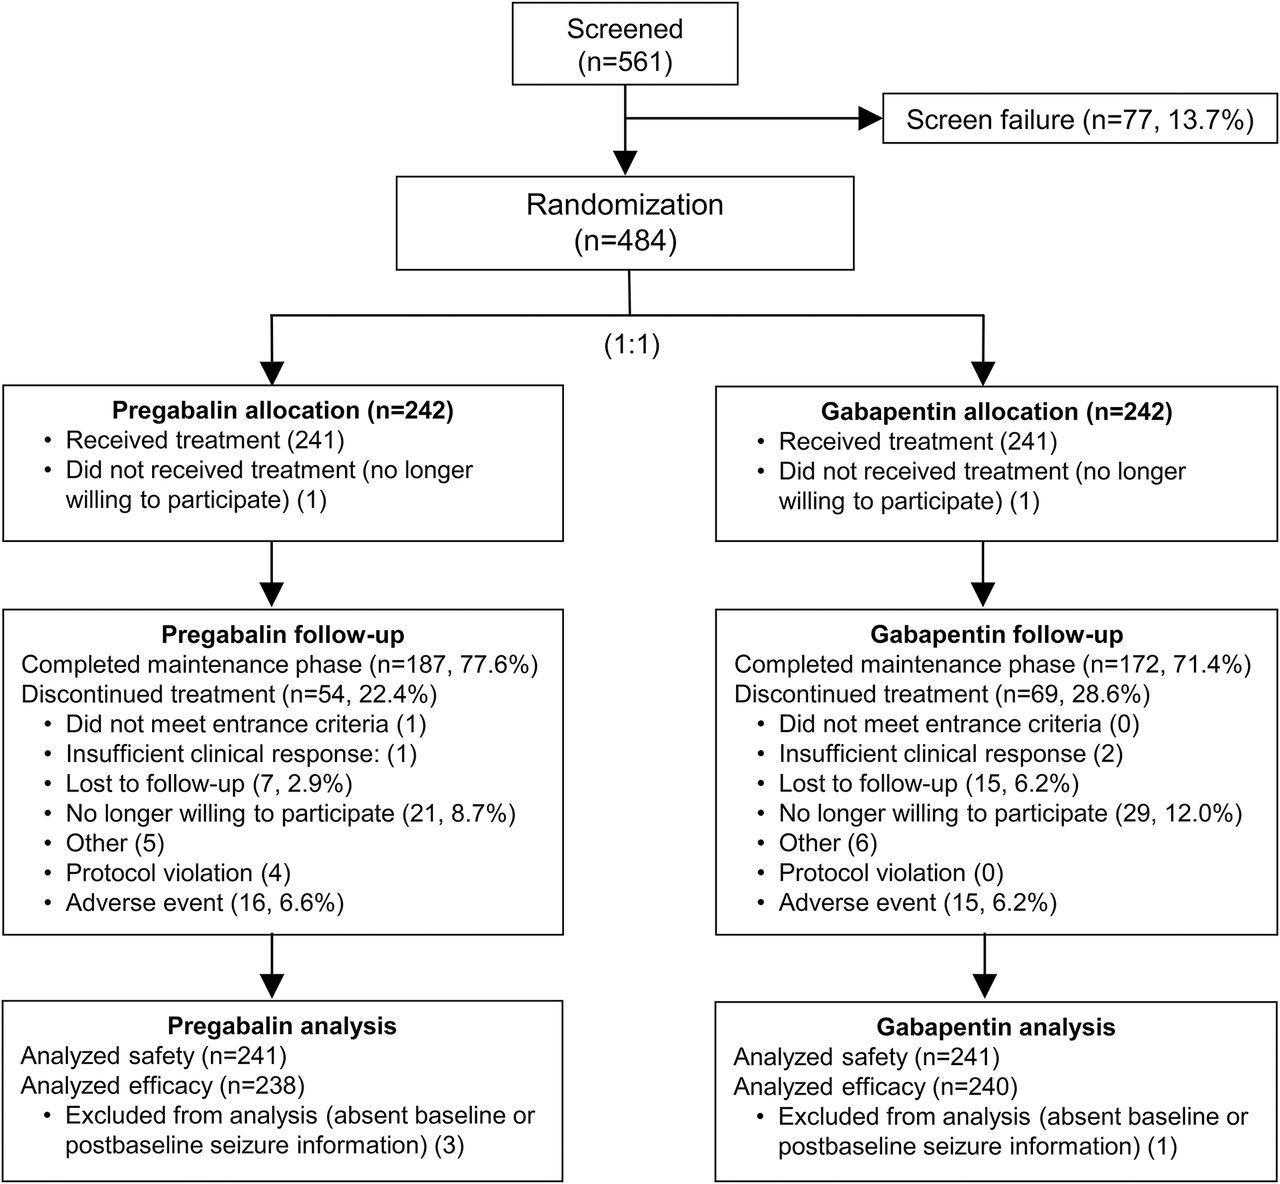 Adjunctive pregabalin vs gabapentin for focal seizures